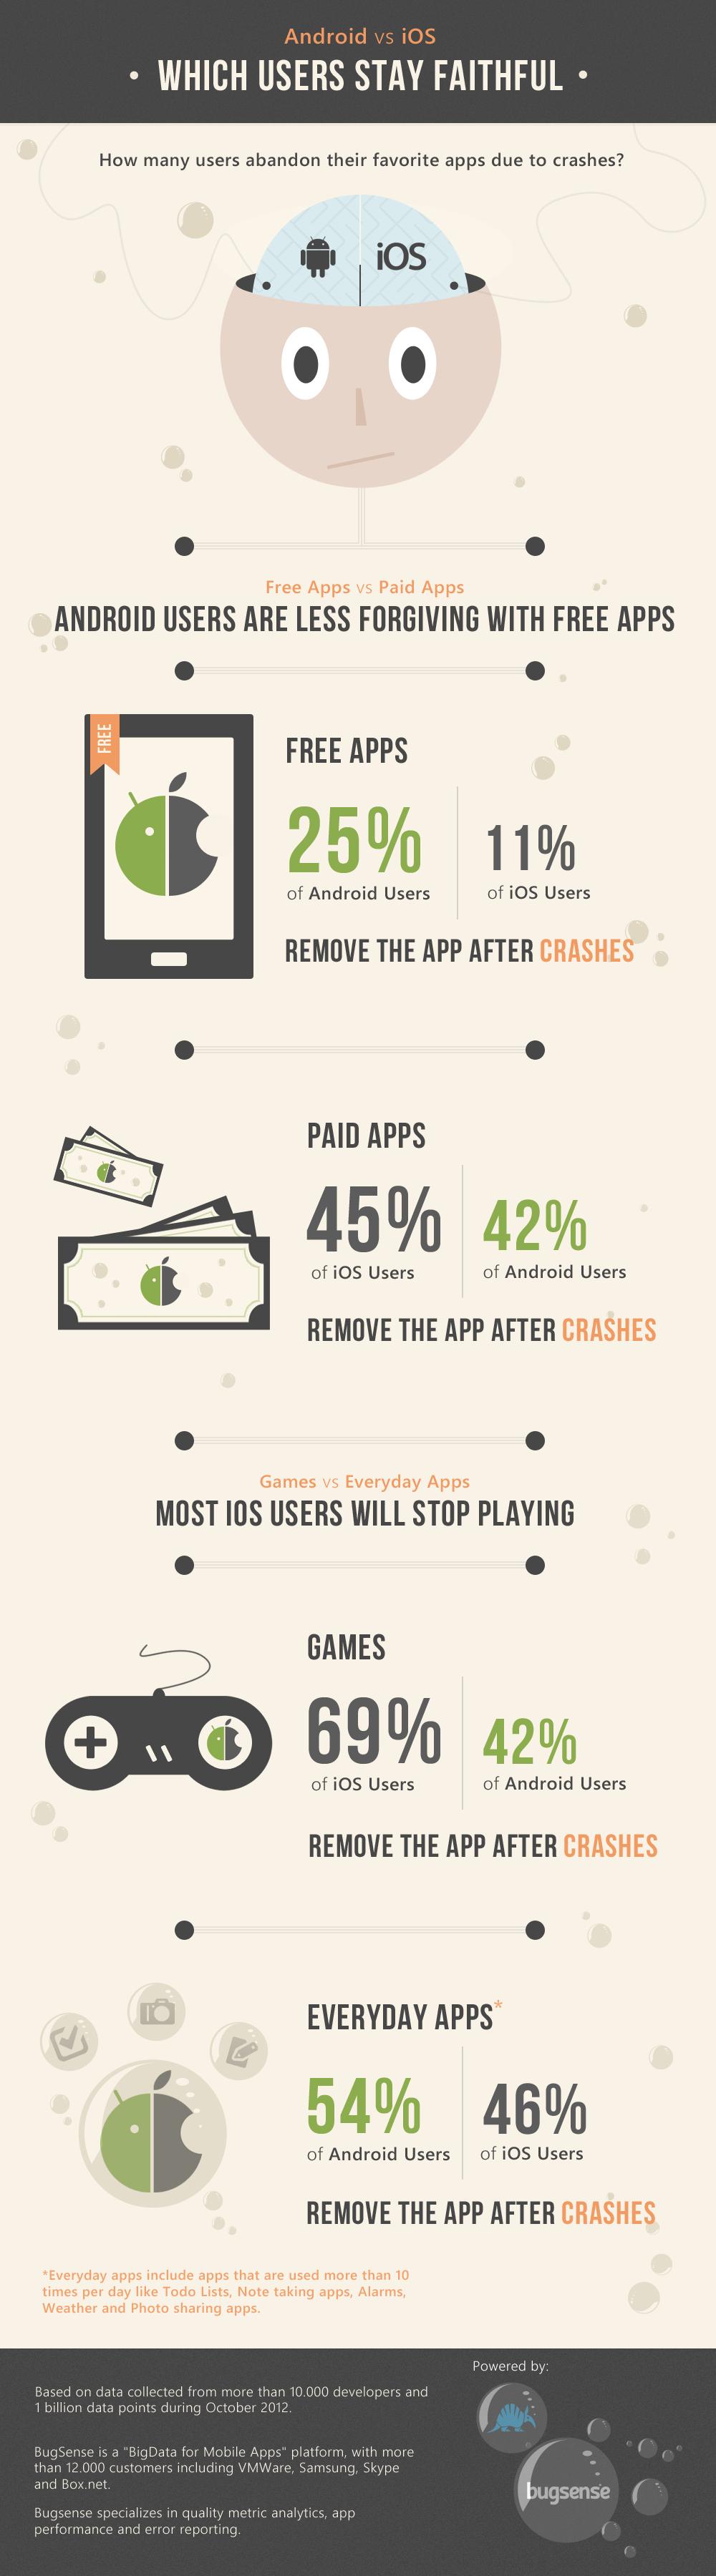 Android vs. iOS: cuáles usuarios permanecen fieles